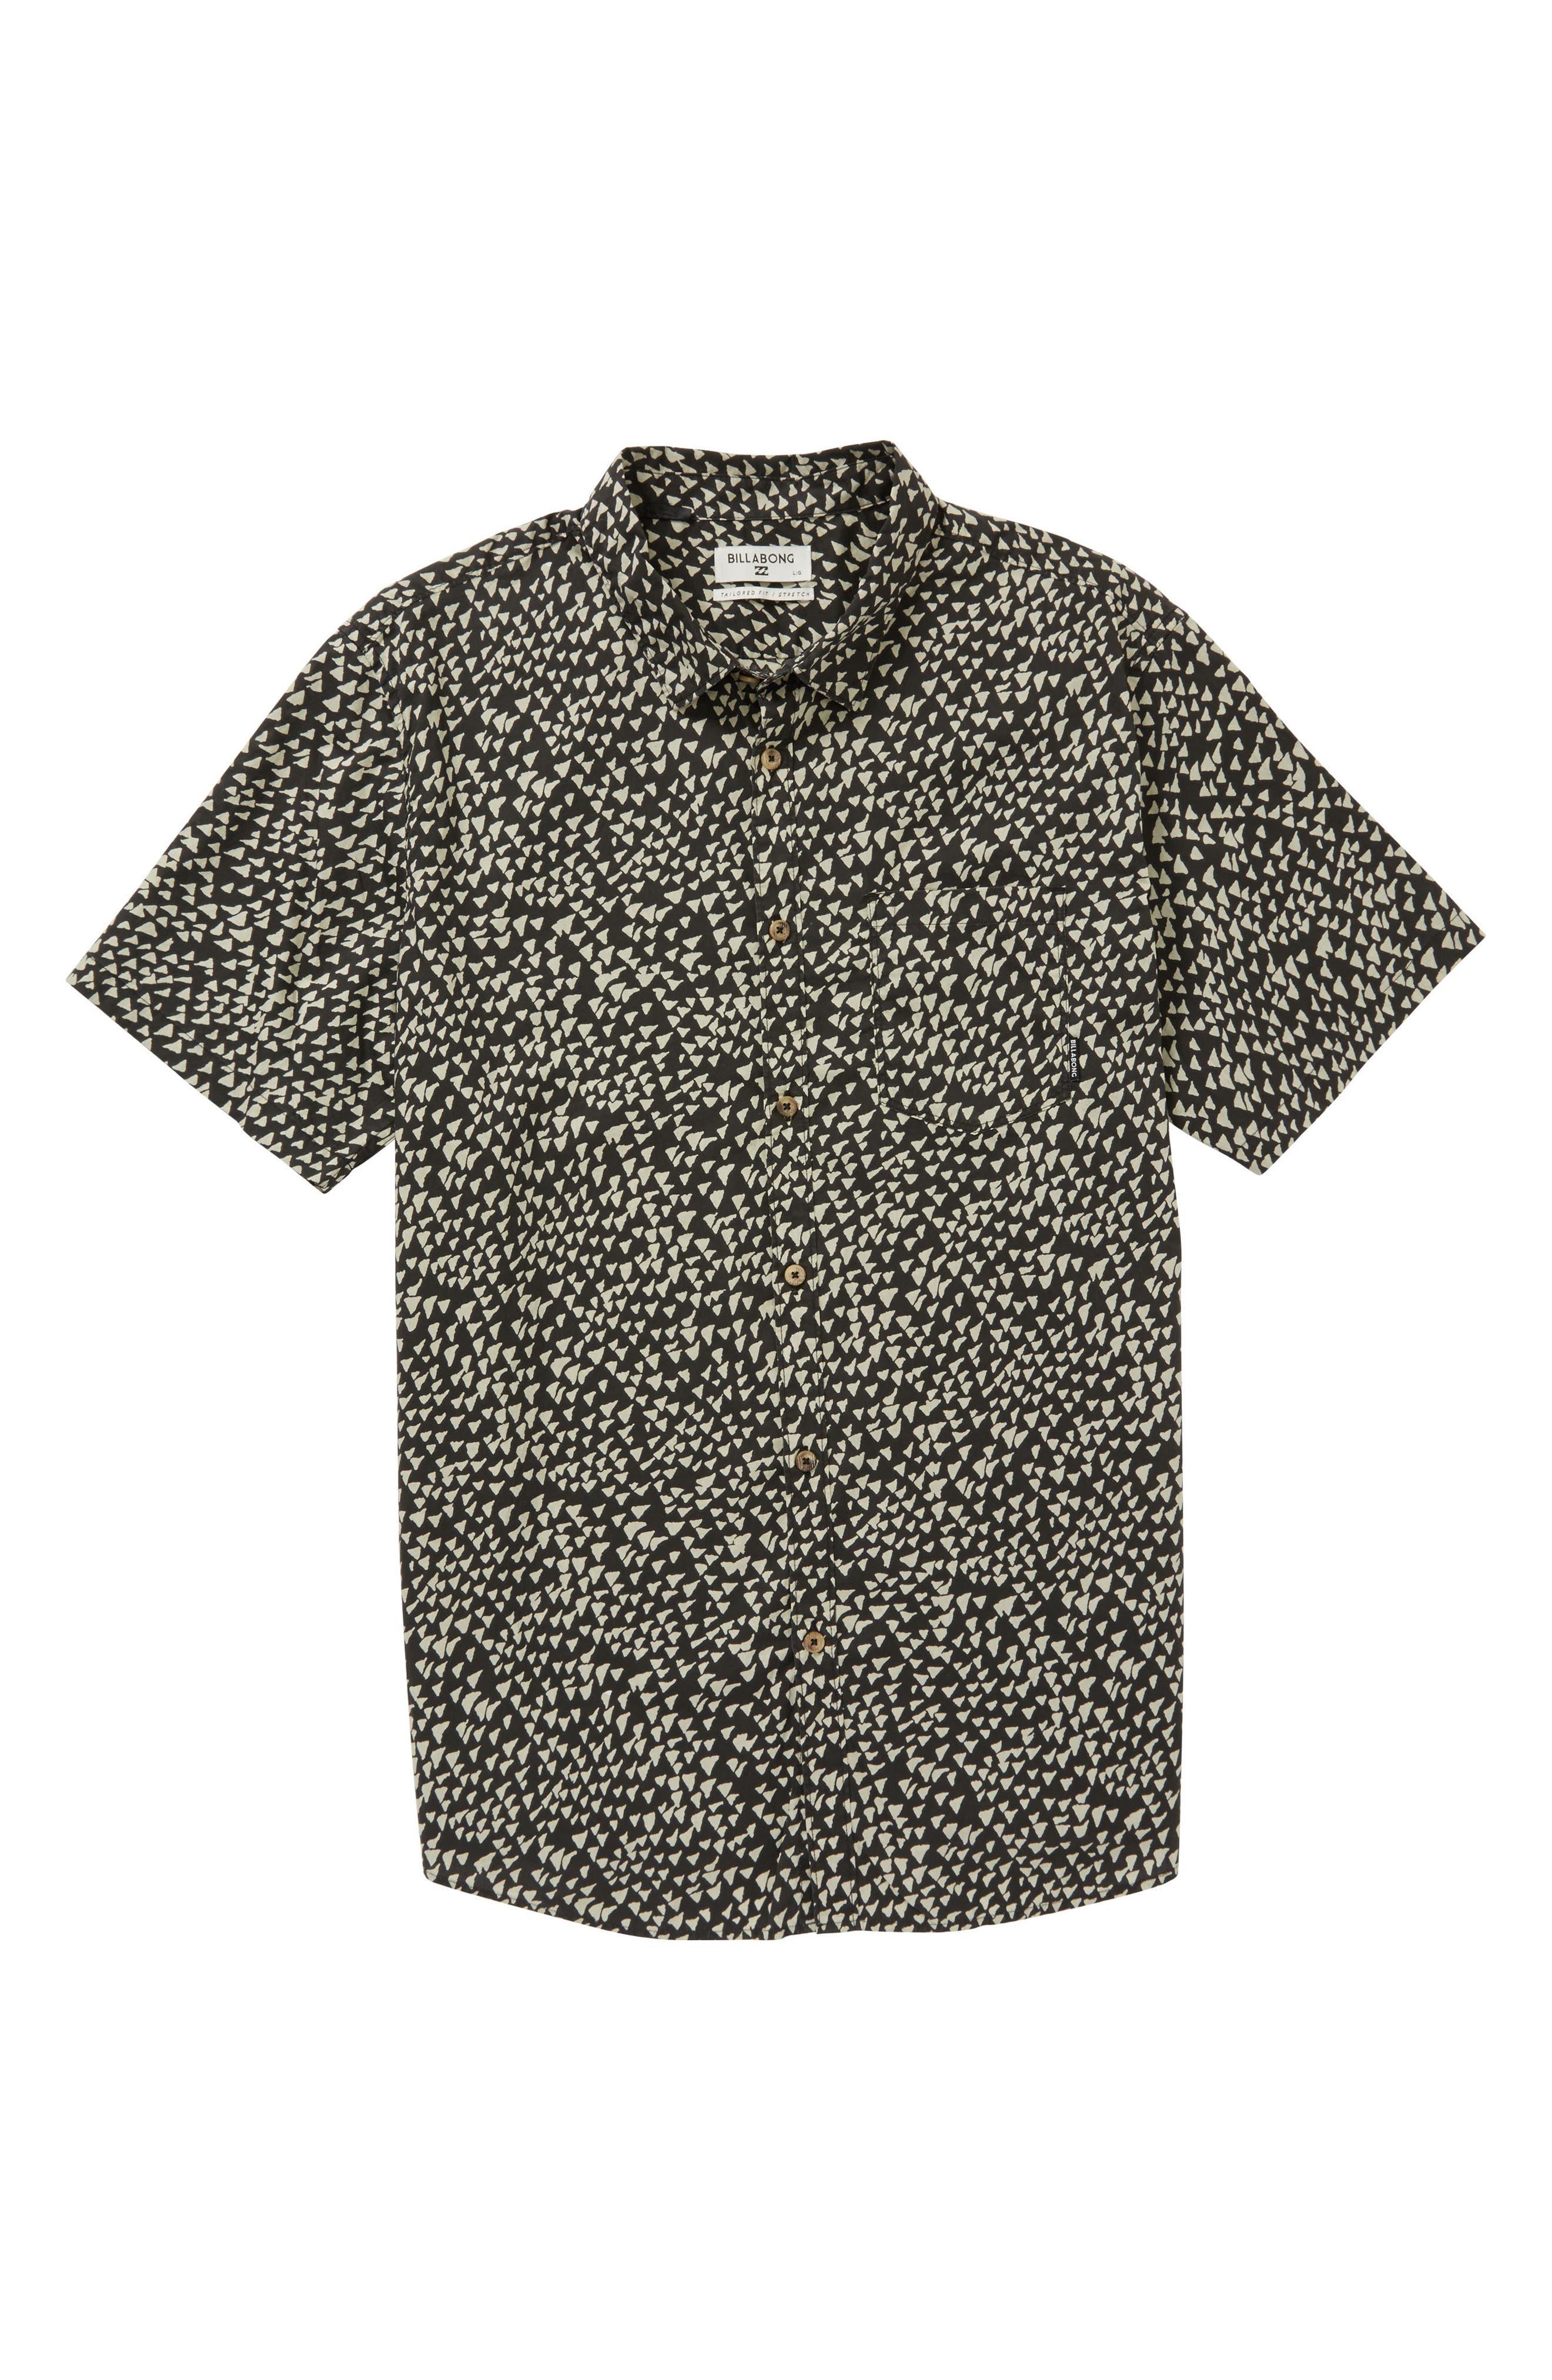 Alternate Image 1 Selected - Billabong Sundays Woven Shirt (Little Boys)